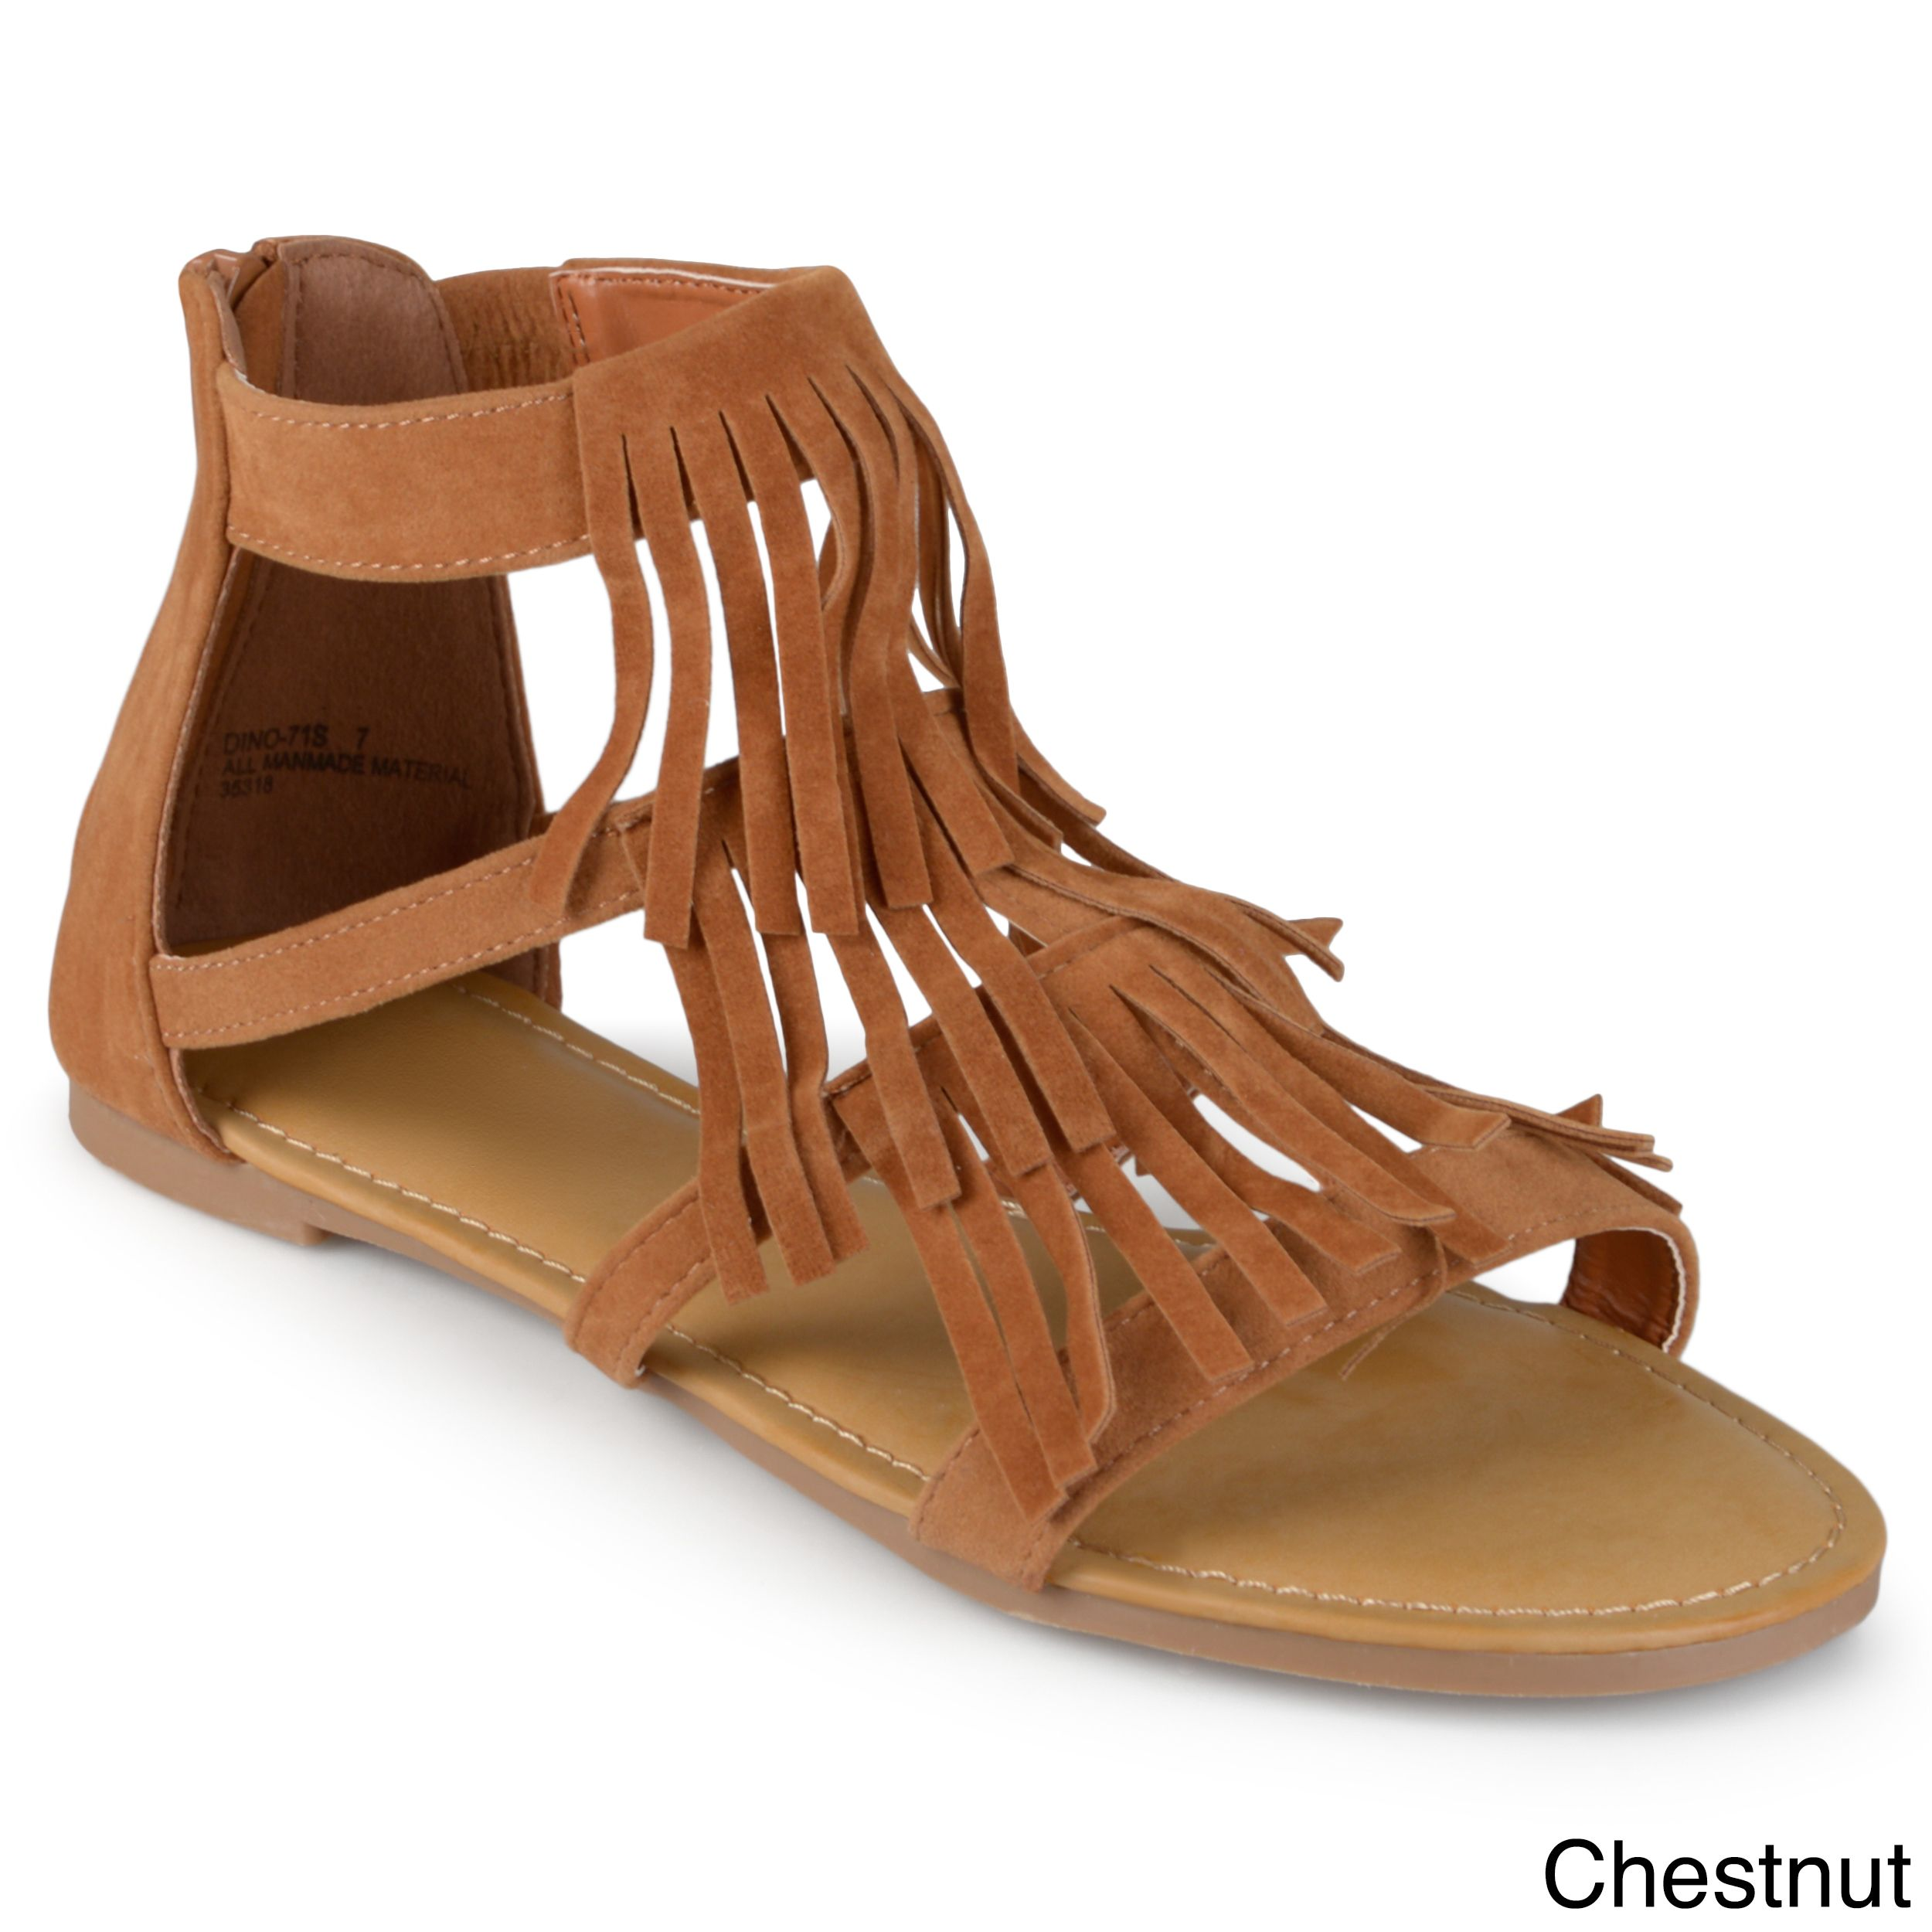 Journee Collection Women's 'Zana' Fringed Flat Gladiator Sandals